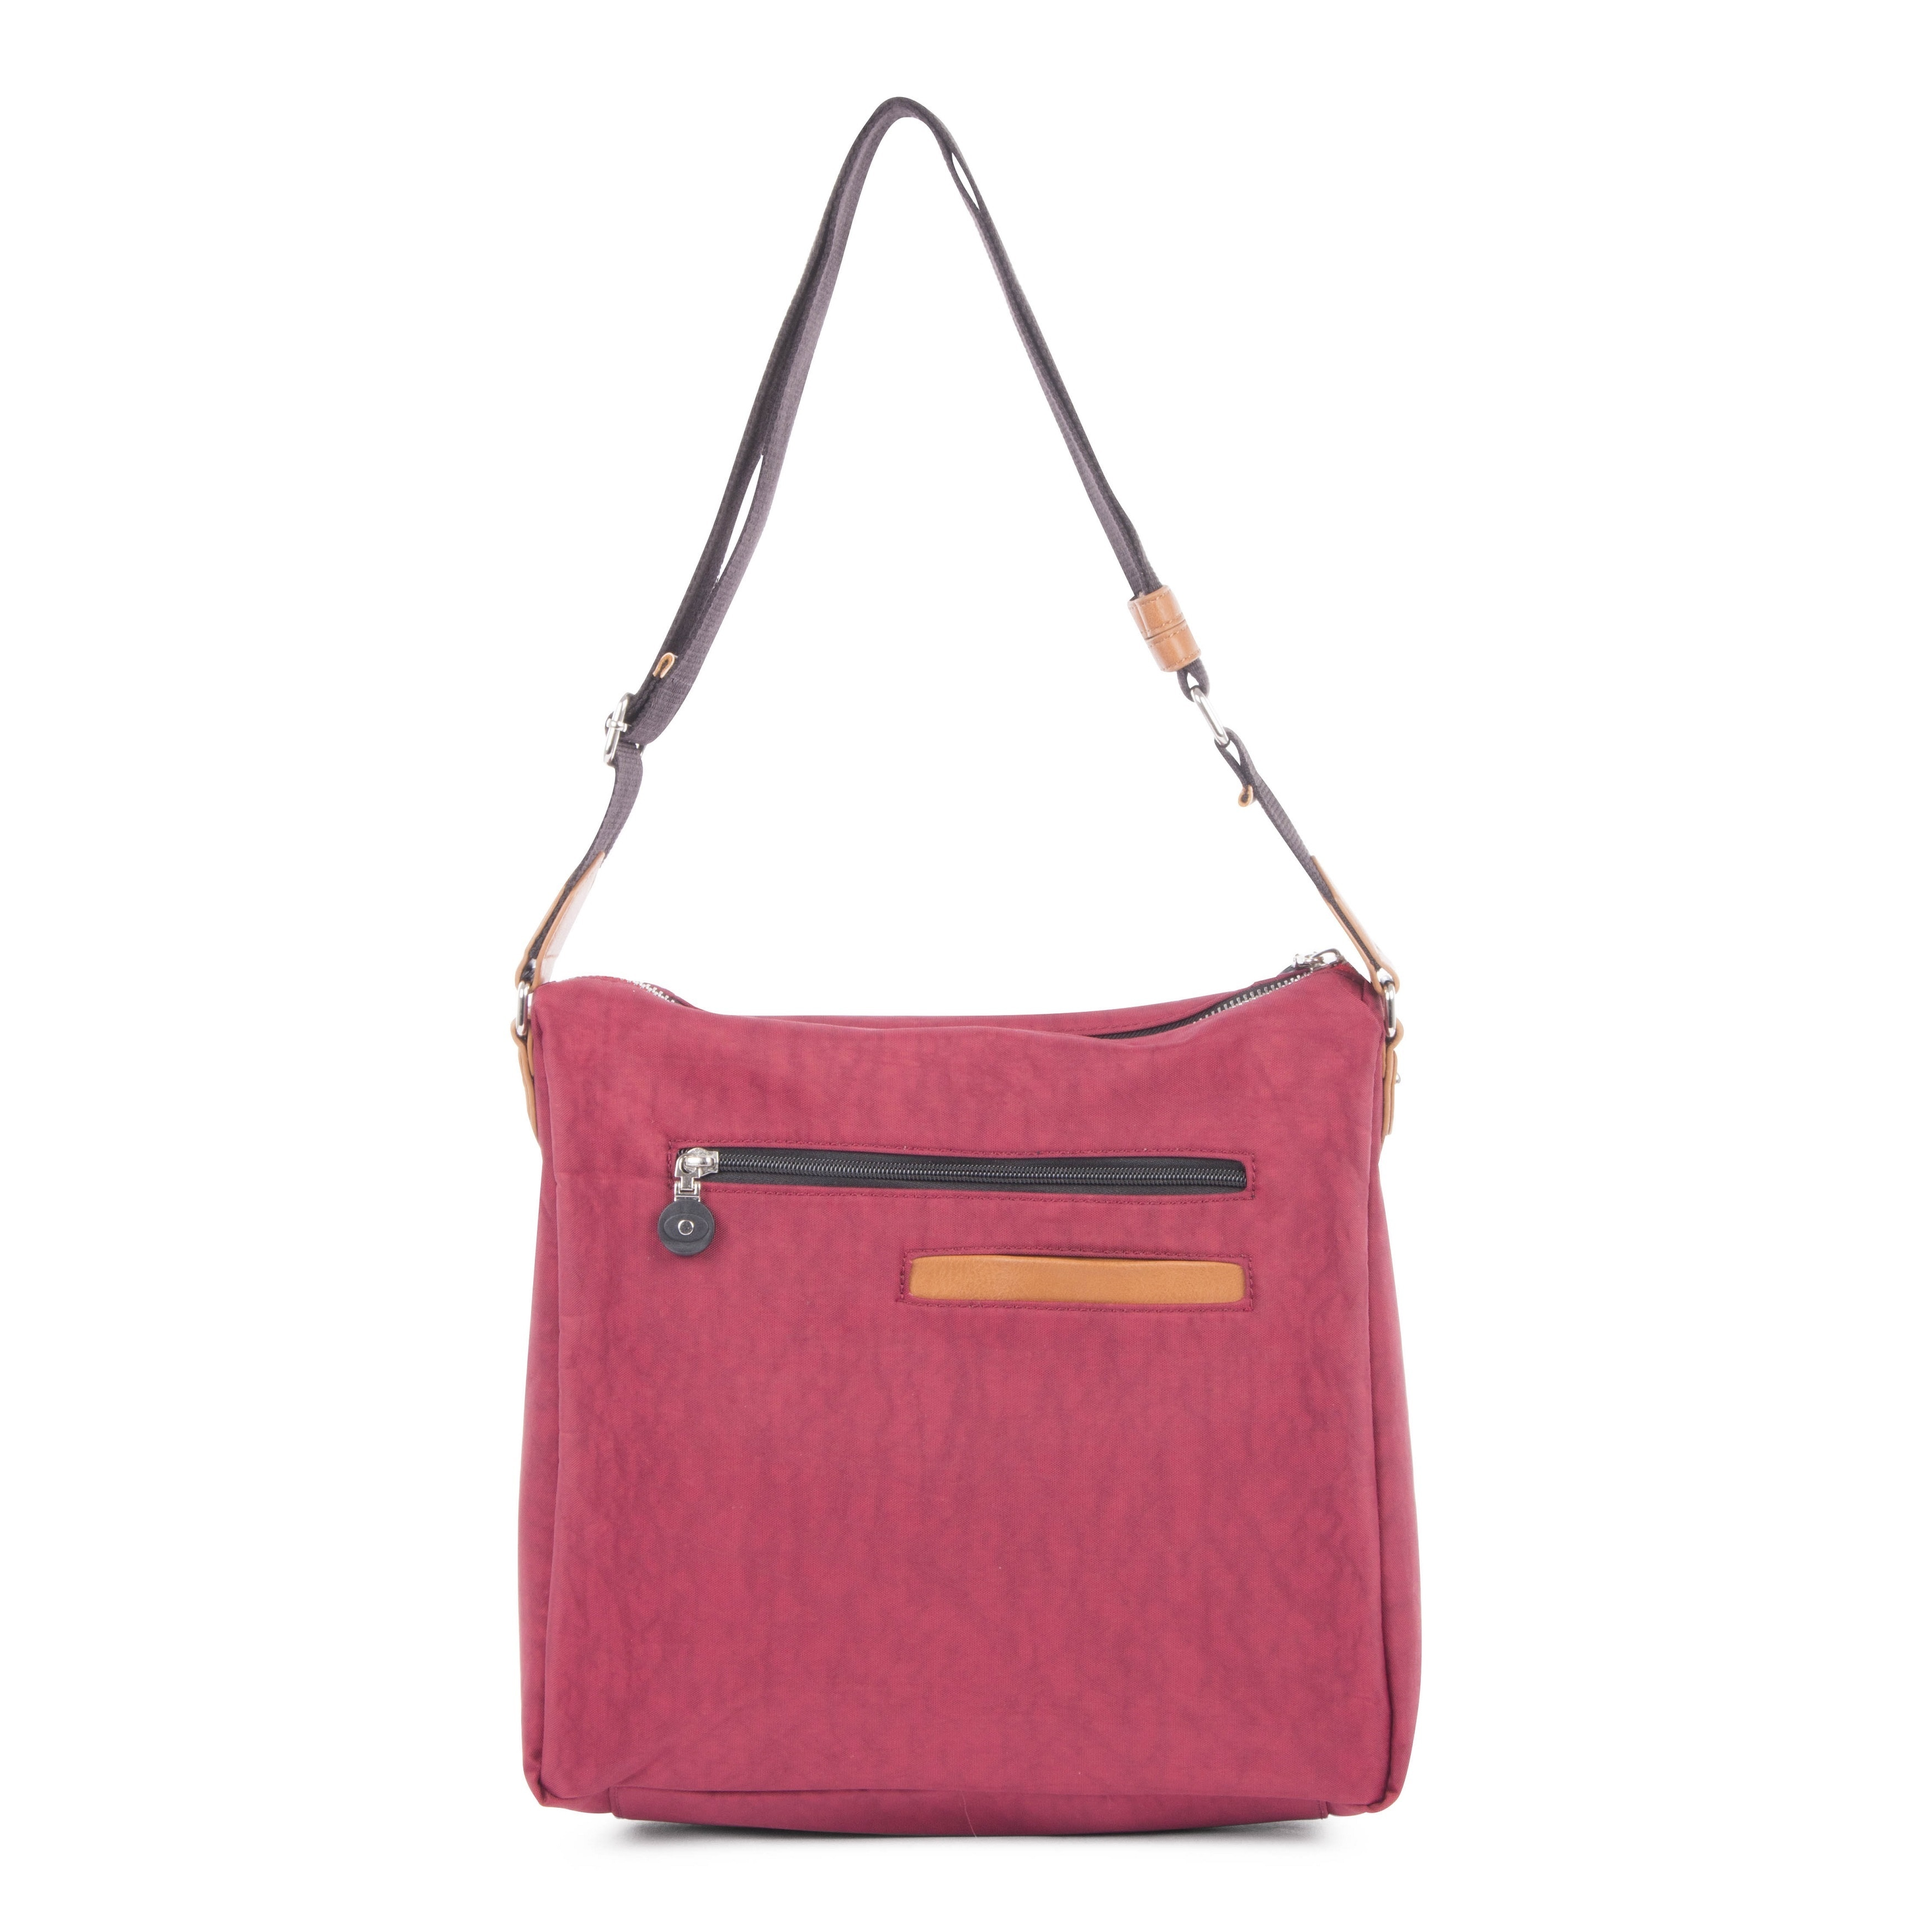 Elizabeth Bag Brie Sling Pink Daftar Harga Terlengkap Indonesia Madeline Tote Putih Bugatti Cloud Black Idb Crossbody Handbag 448e1a10 7fd8